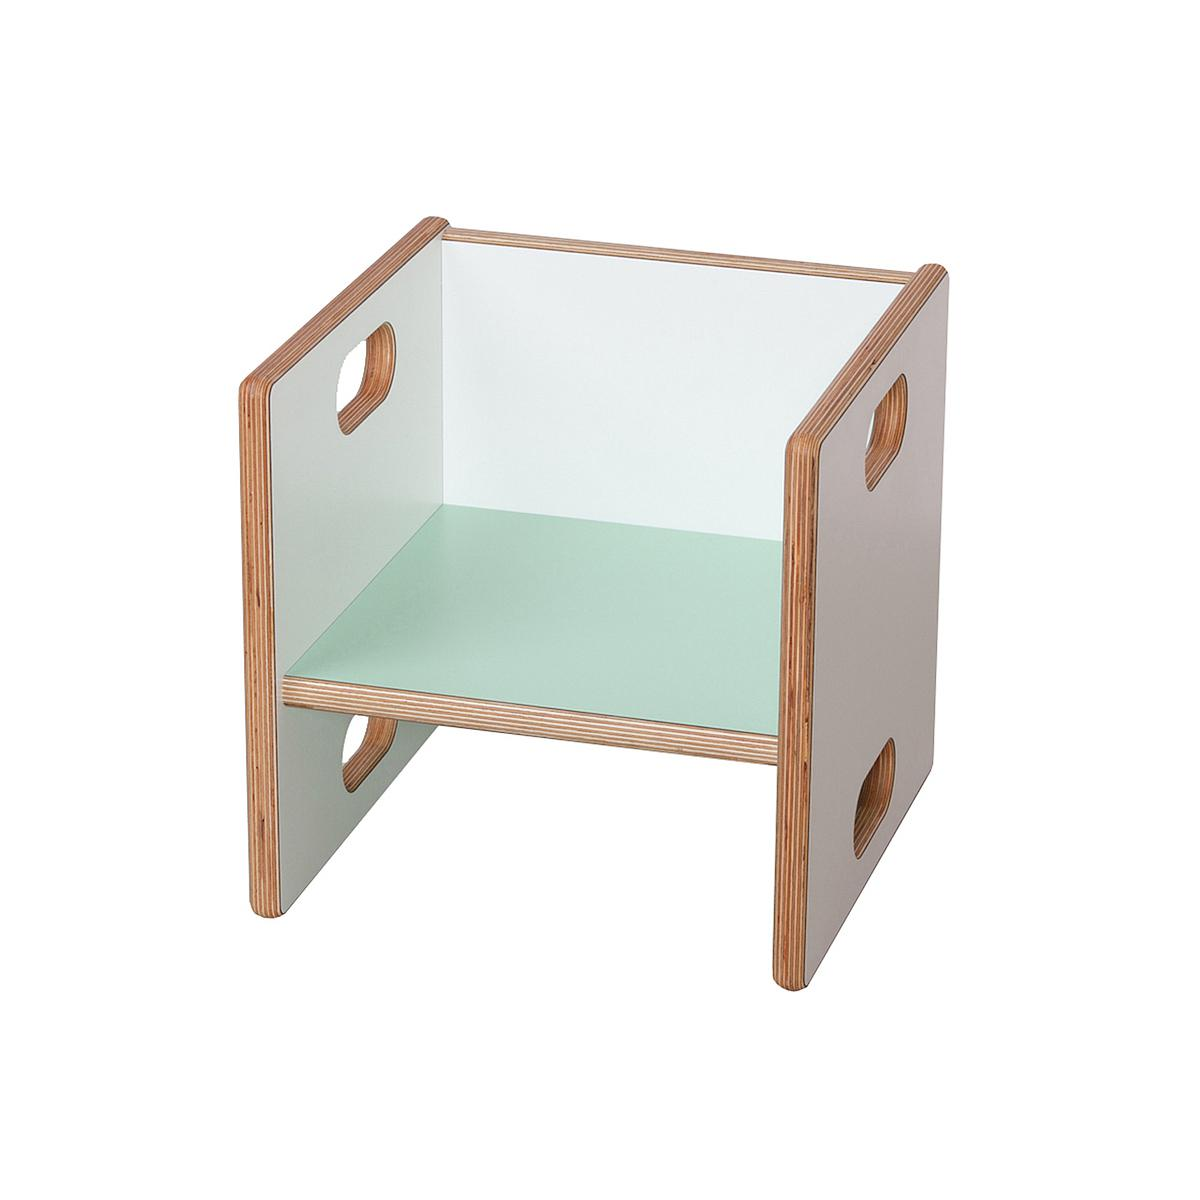 Wandelstuhl DECOR Debreuyn Multiplex-weiß Sitzfläche mint - OHNE VERPACKUNG B 32 x H 32 x T 32 cm